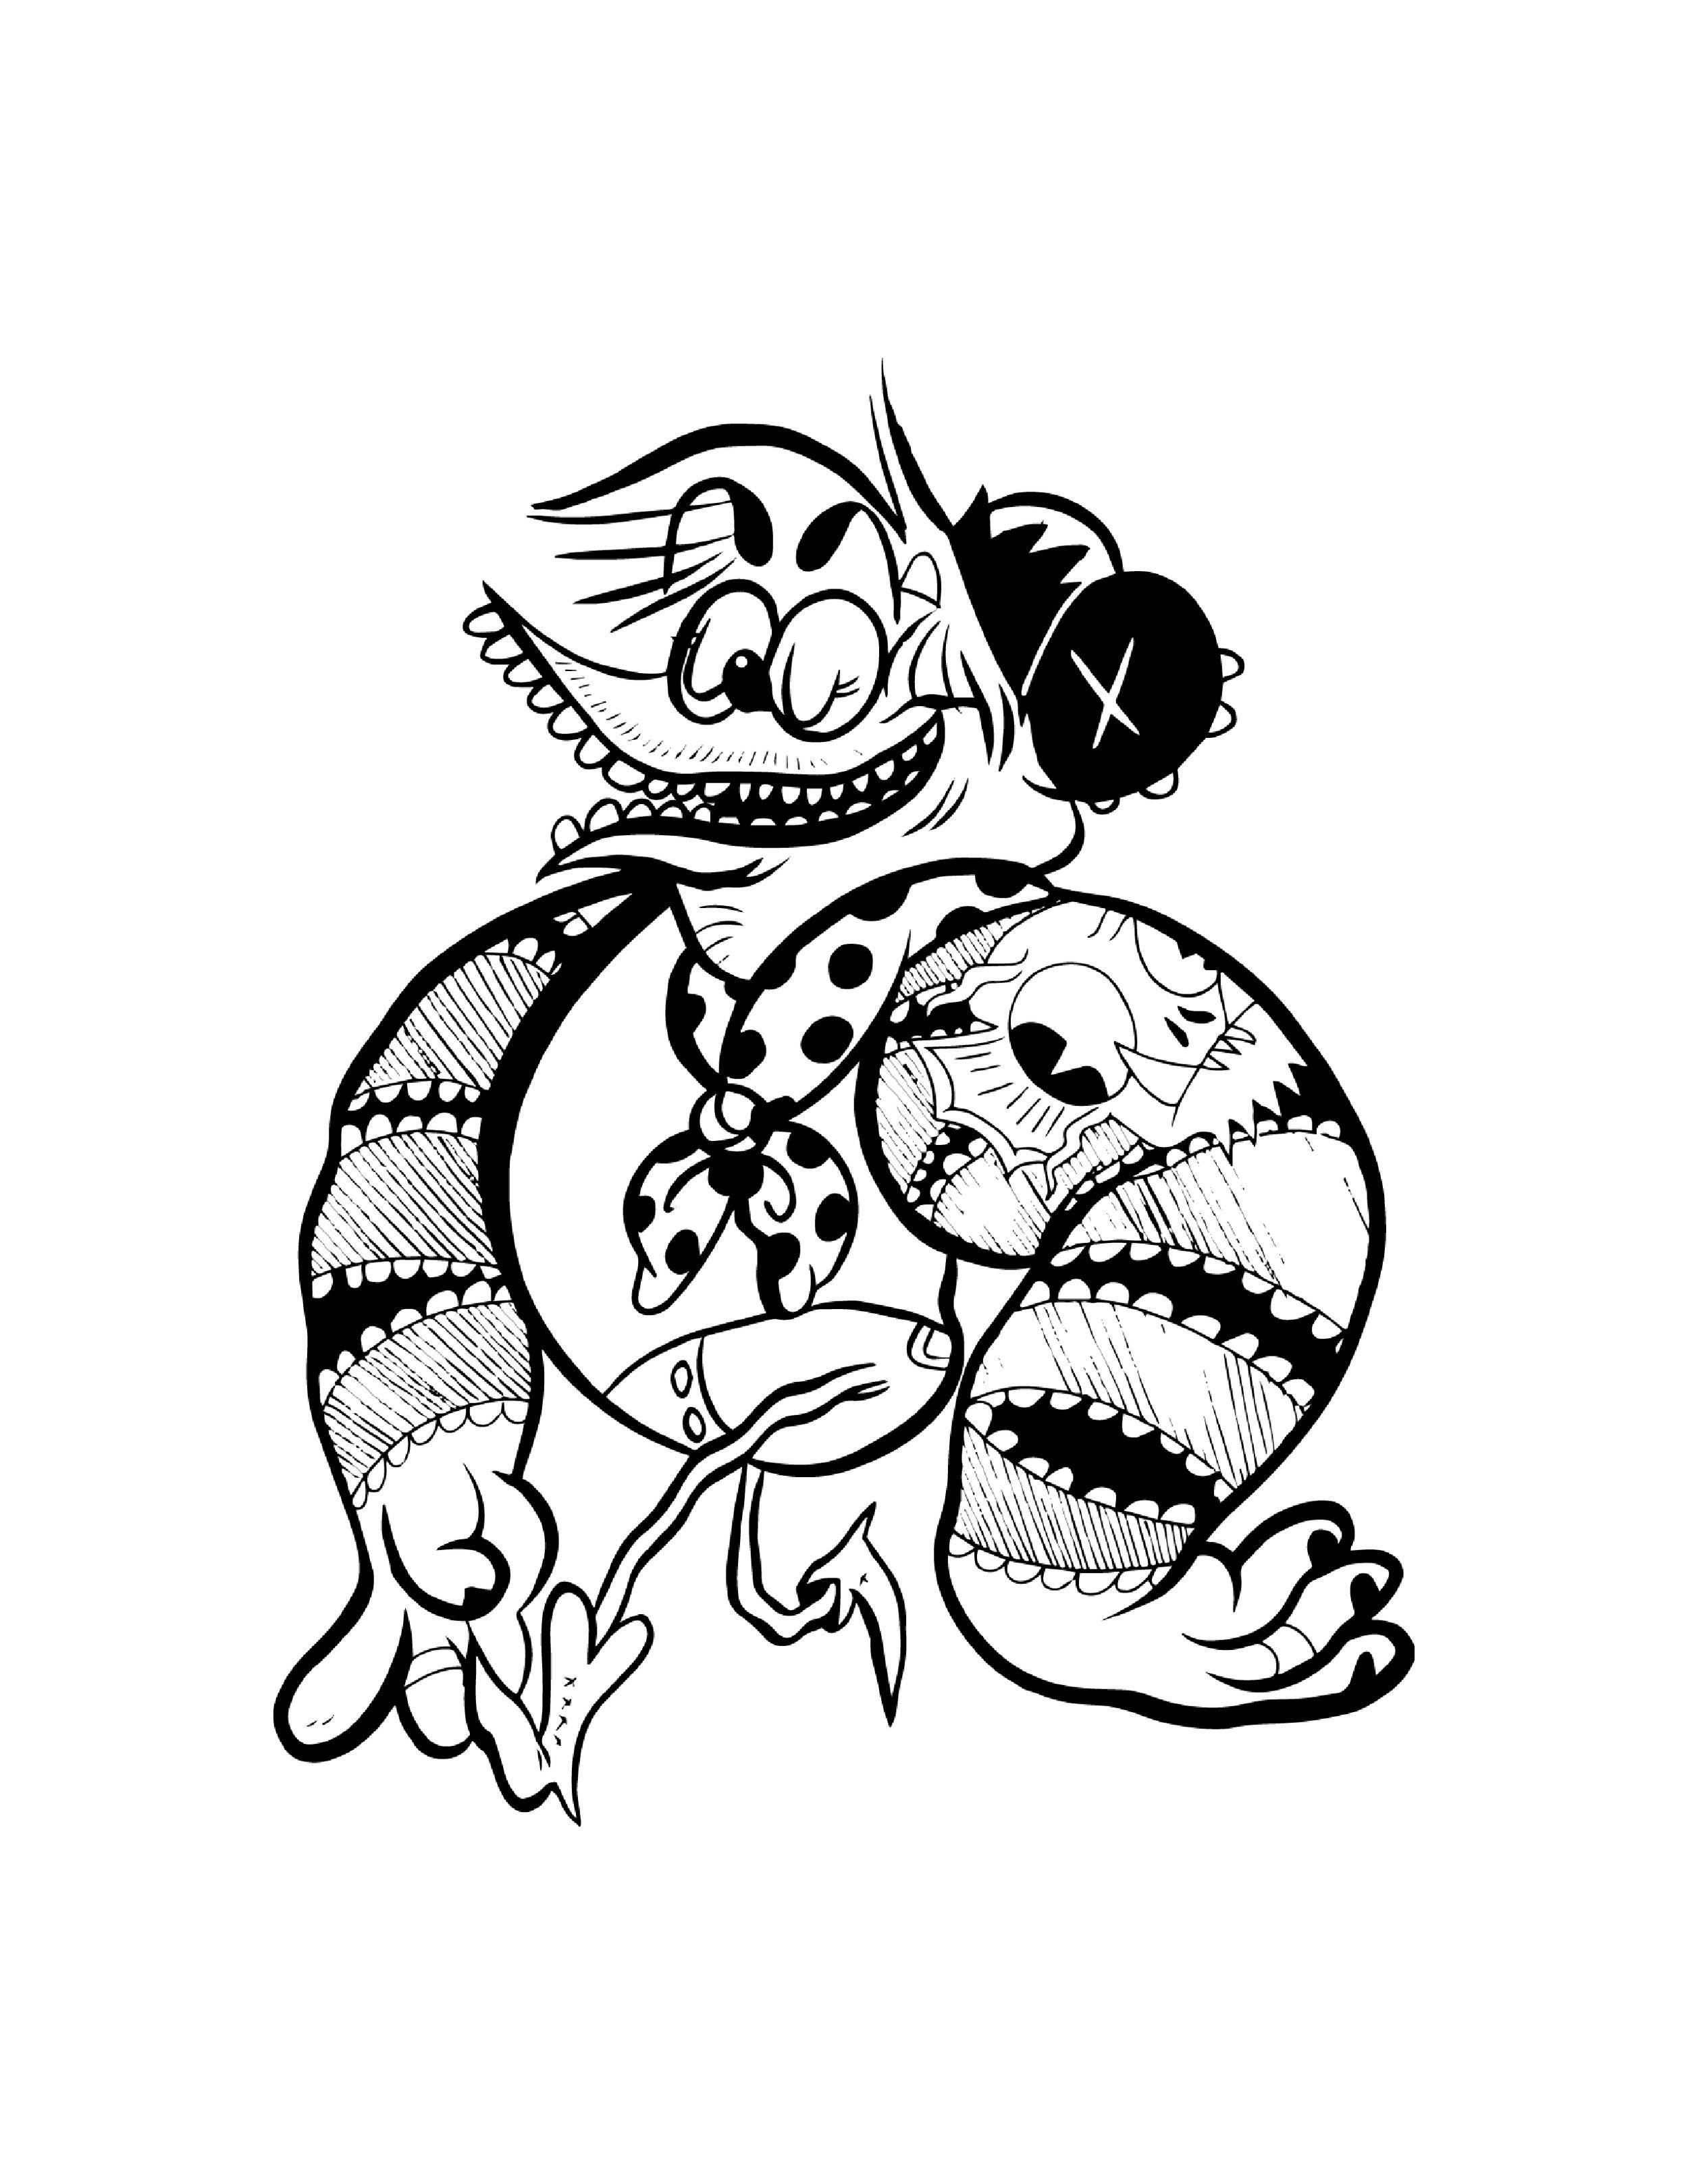 Hatch Comic